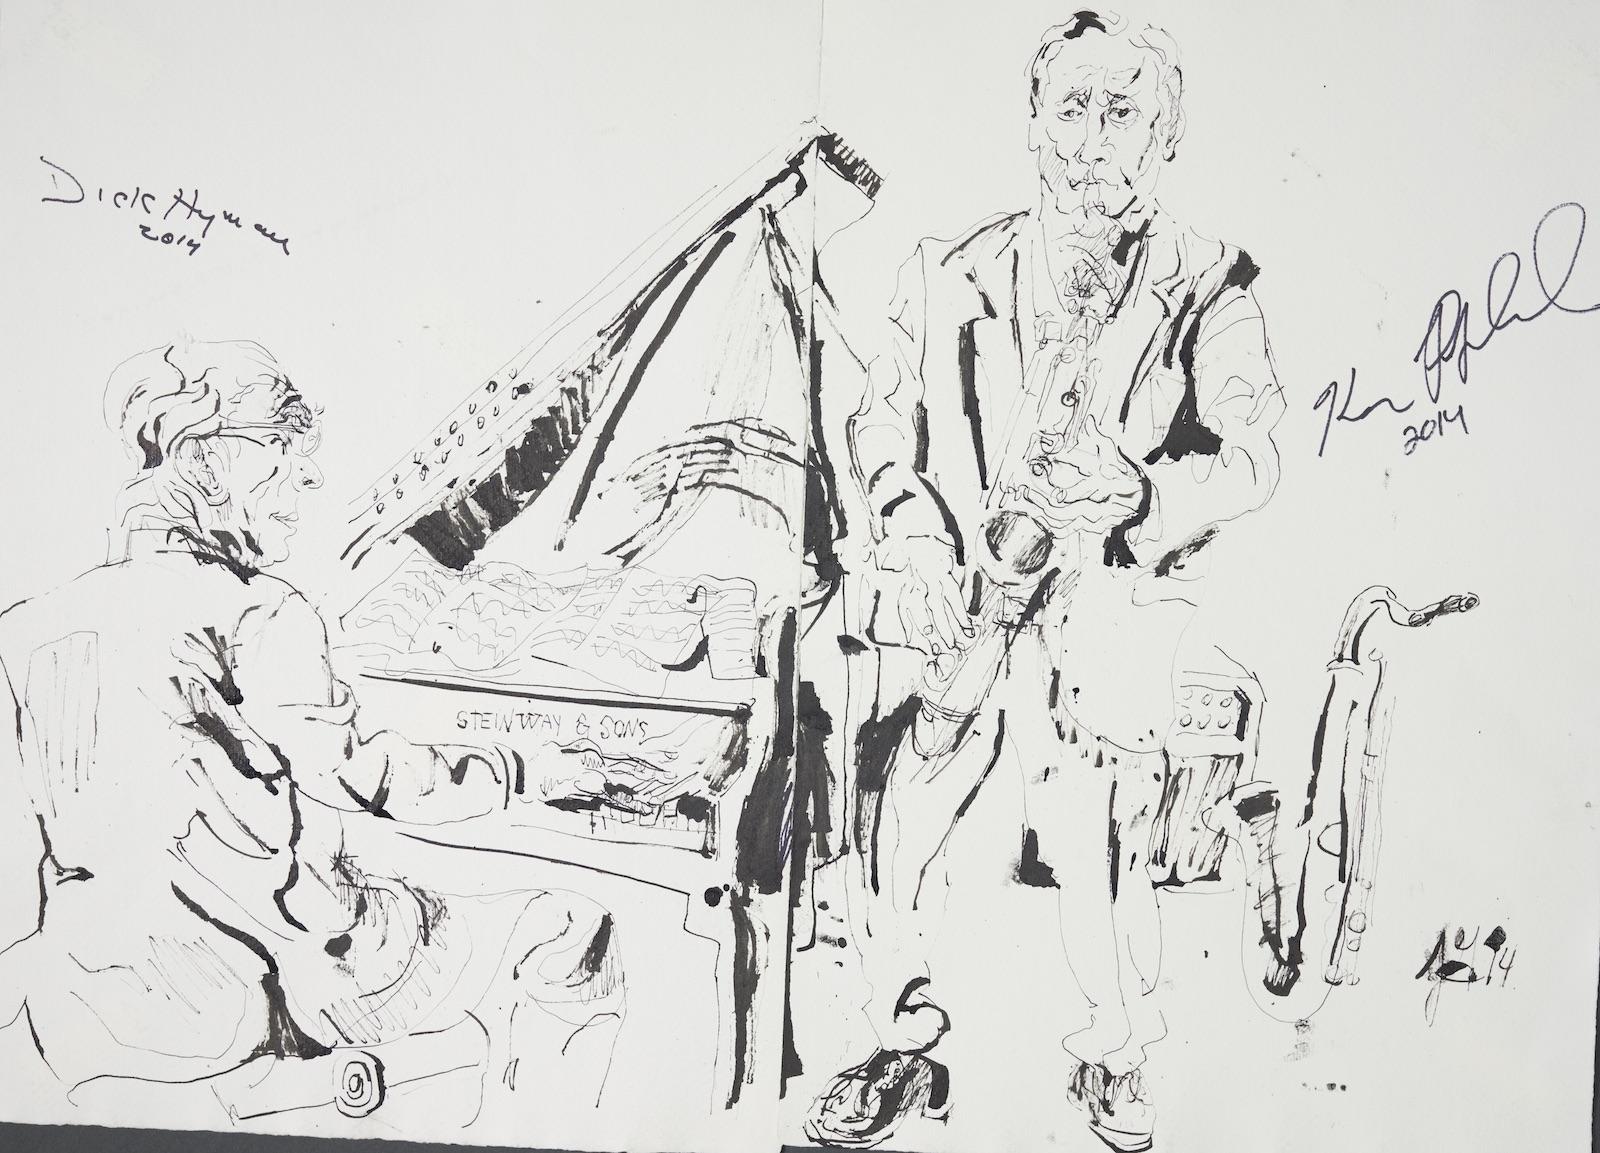 Dick hyman with ken poplowski at the kitano 2014